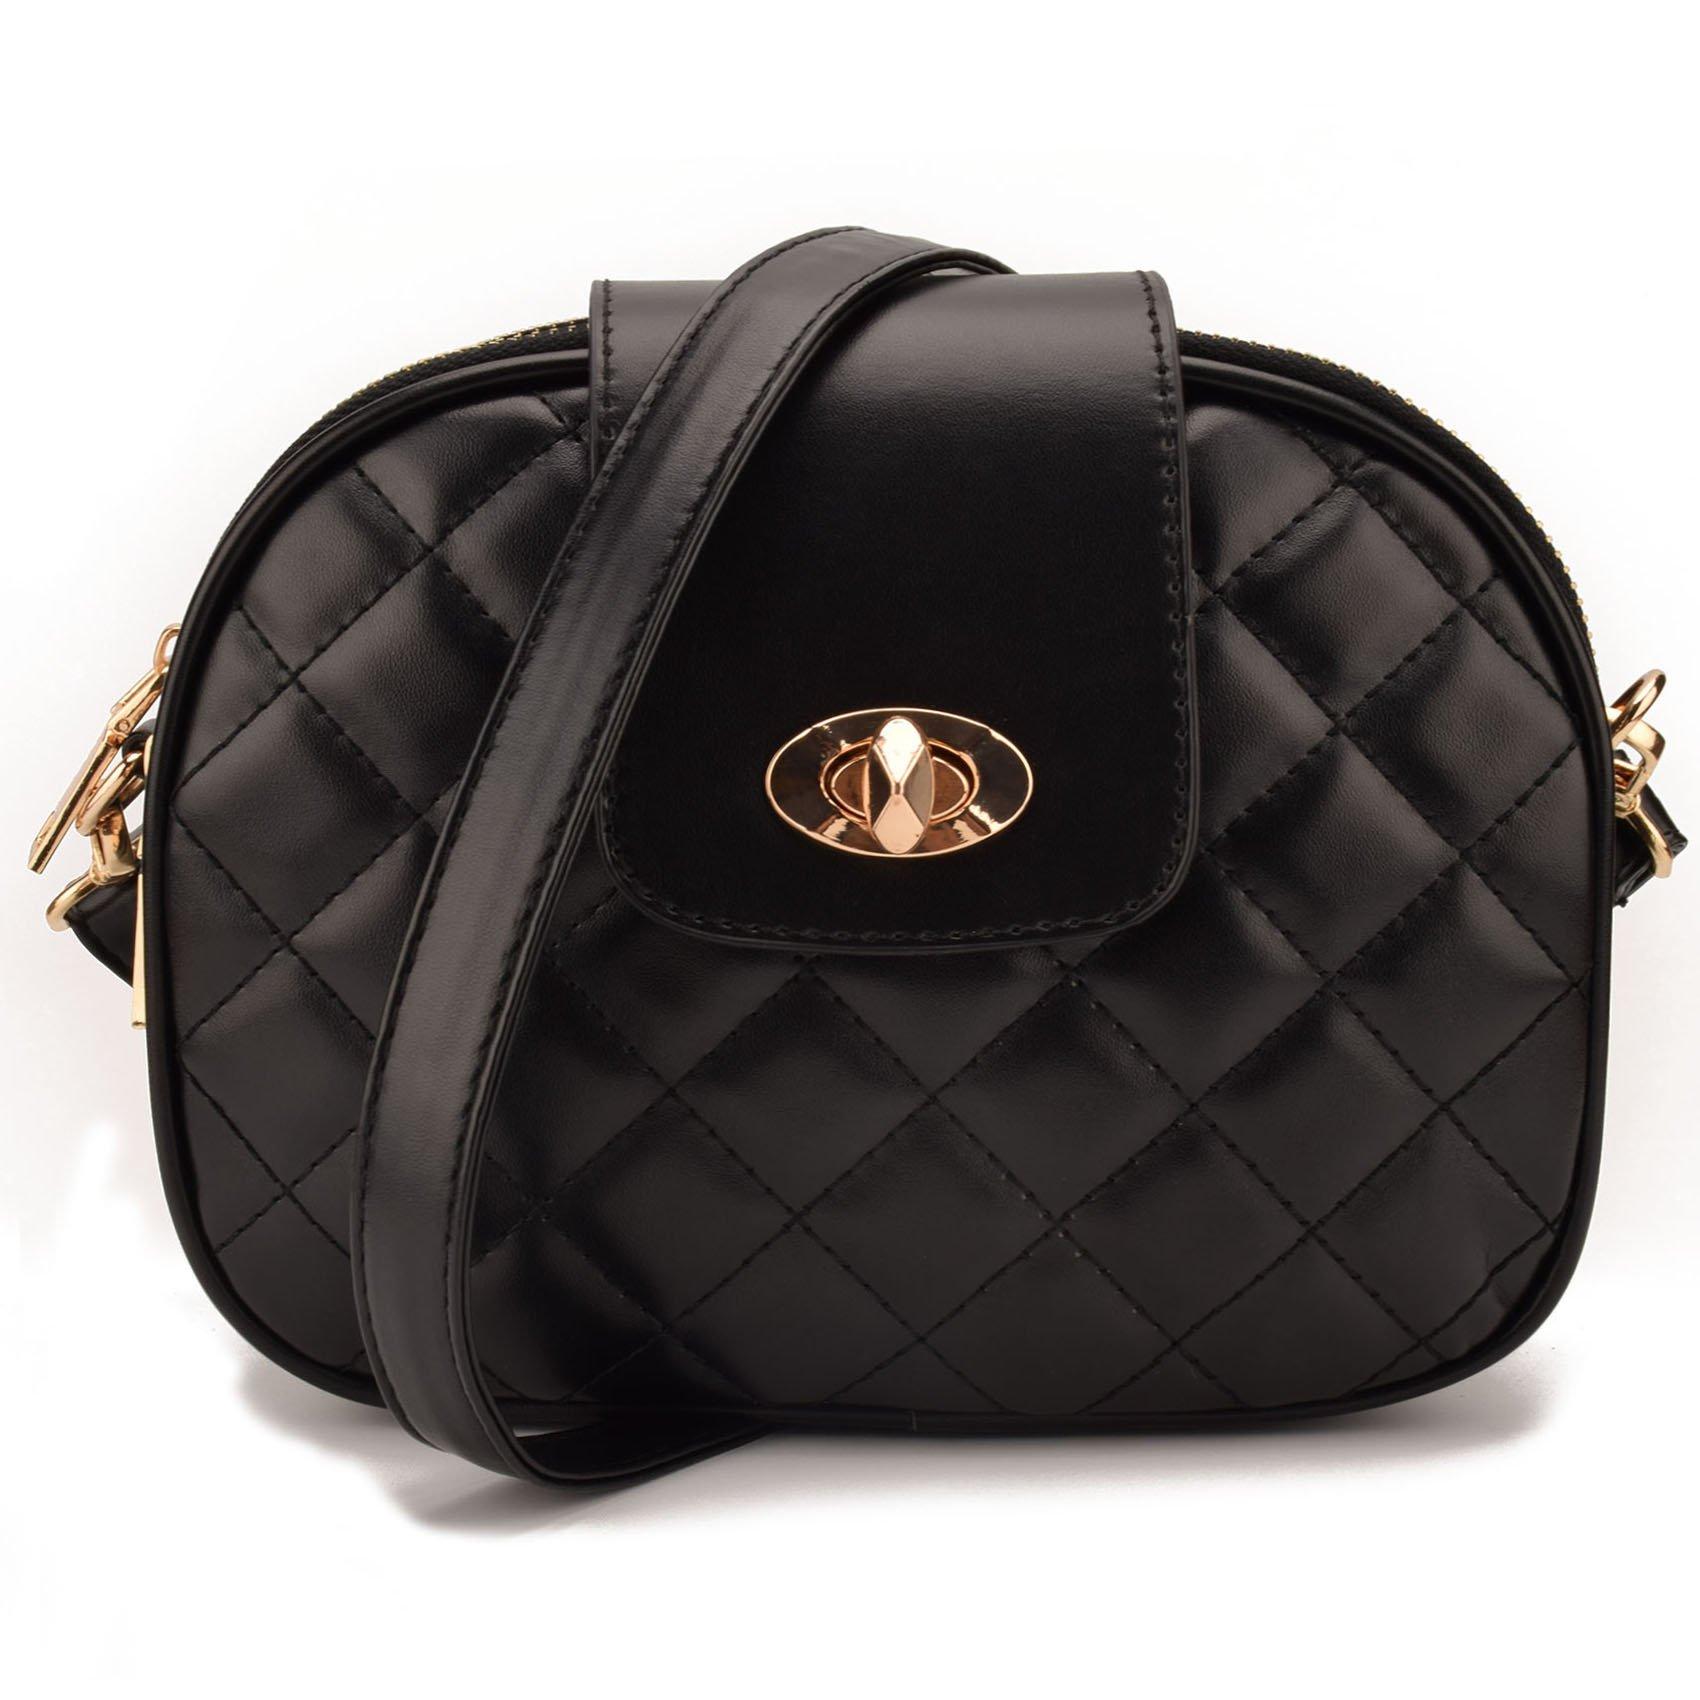 JIARUO Women PU Leather Cross body bag Purses flap Triple main pocket Handbag (Black)